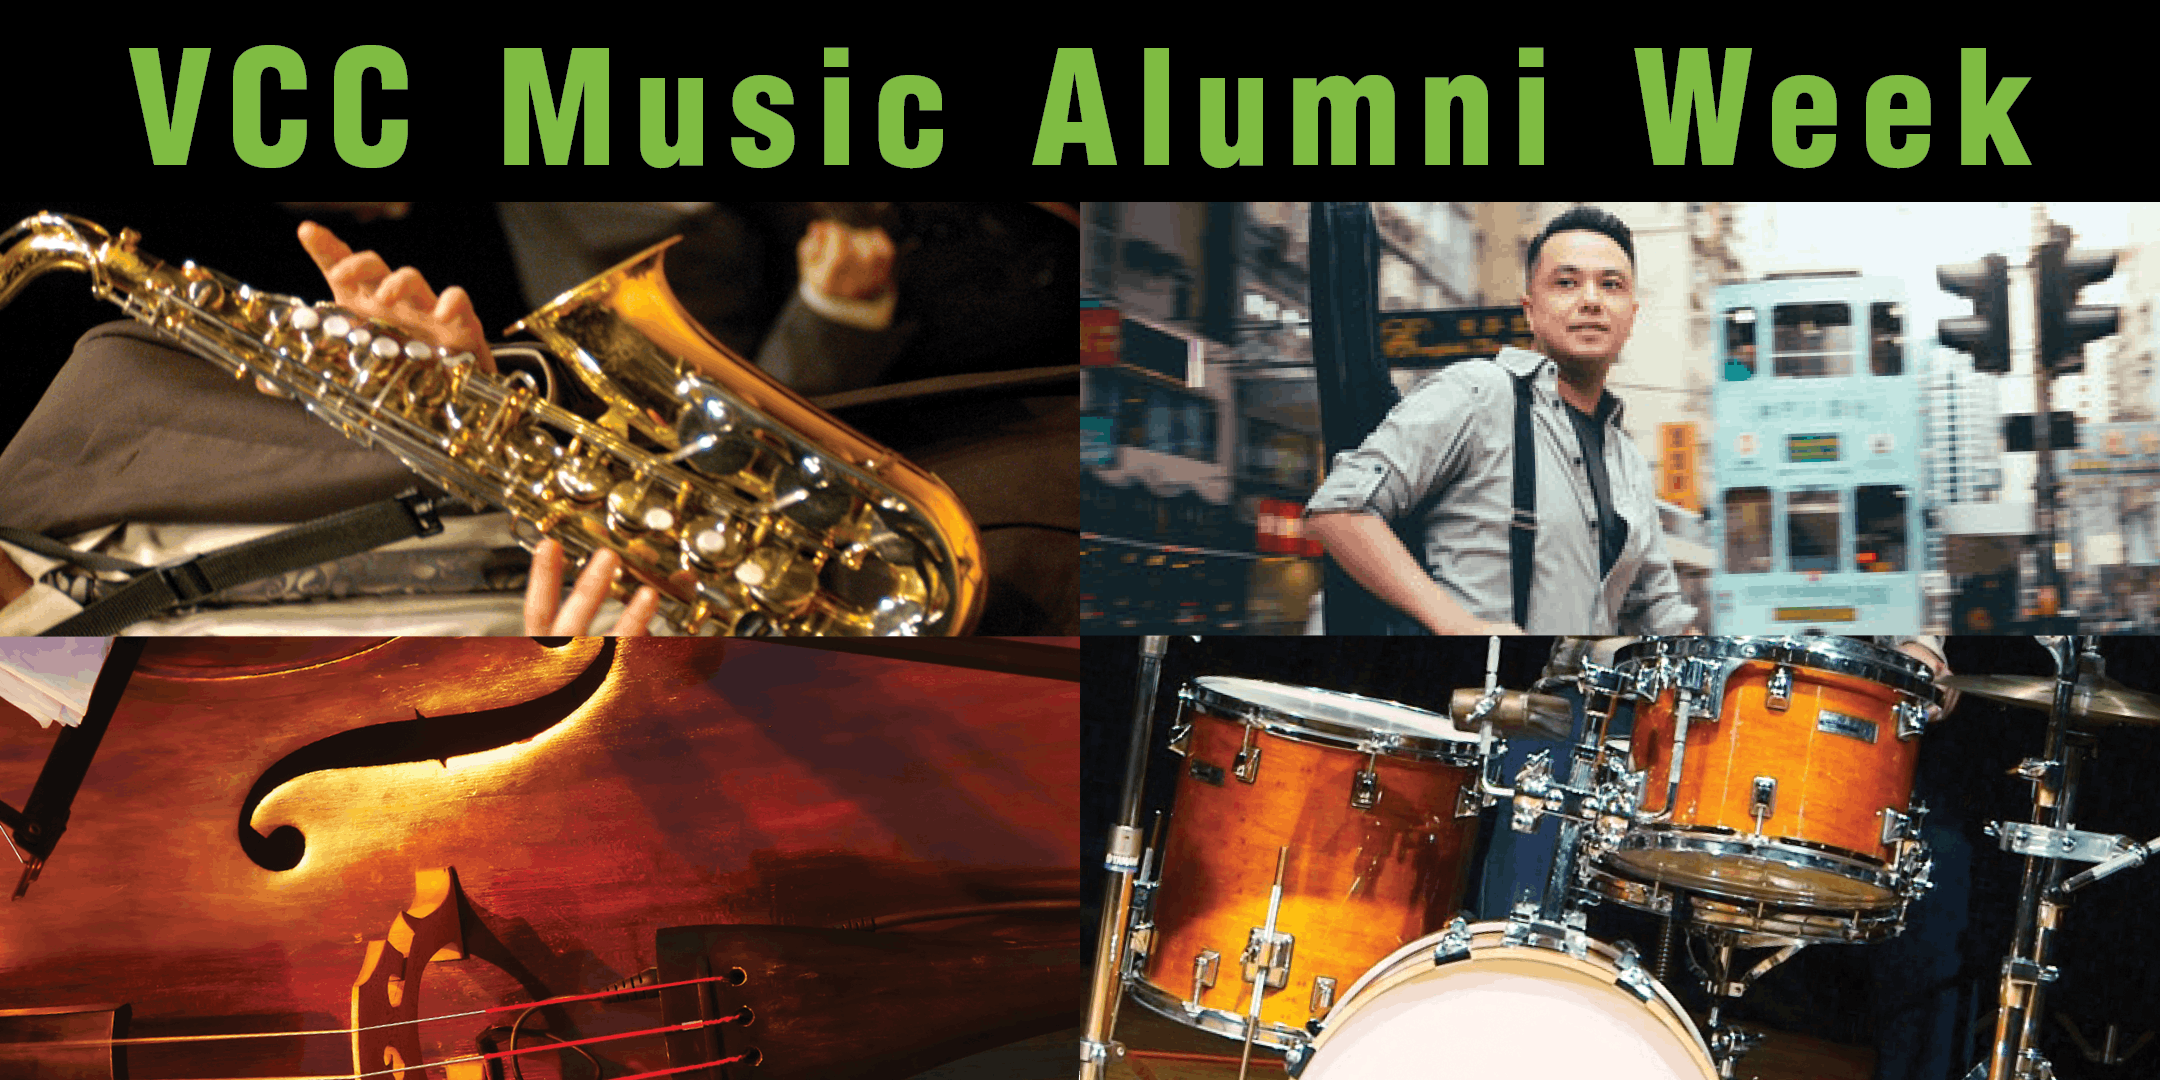 VCC Music Alumni Week - Funky Foodbank Fundra